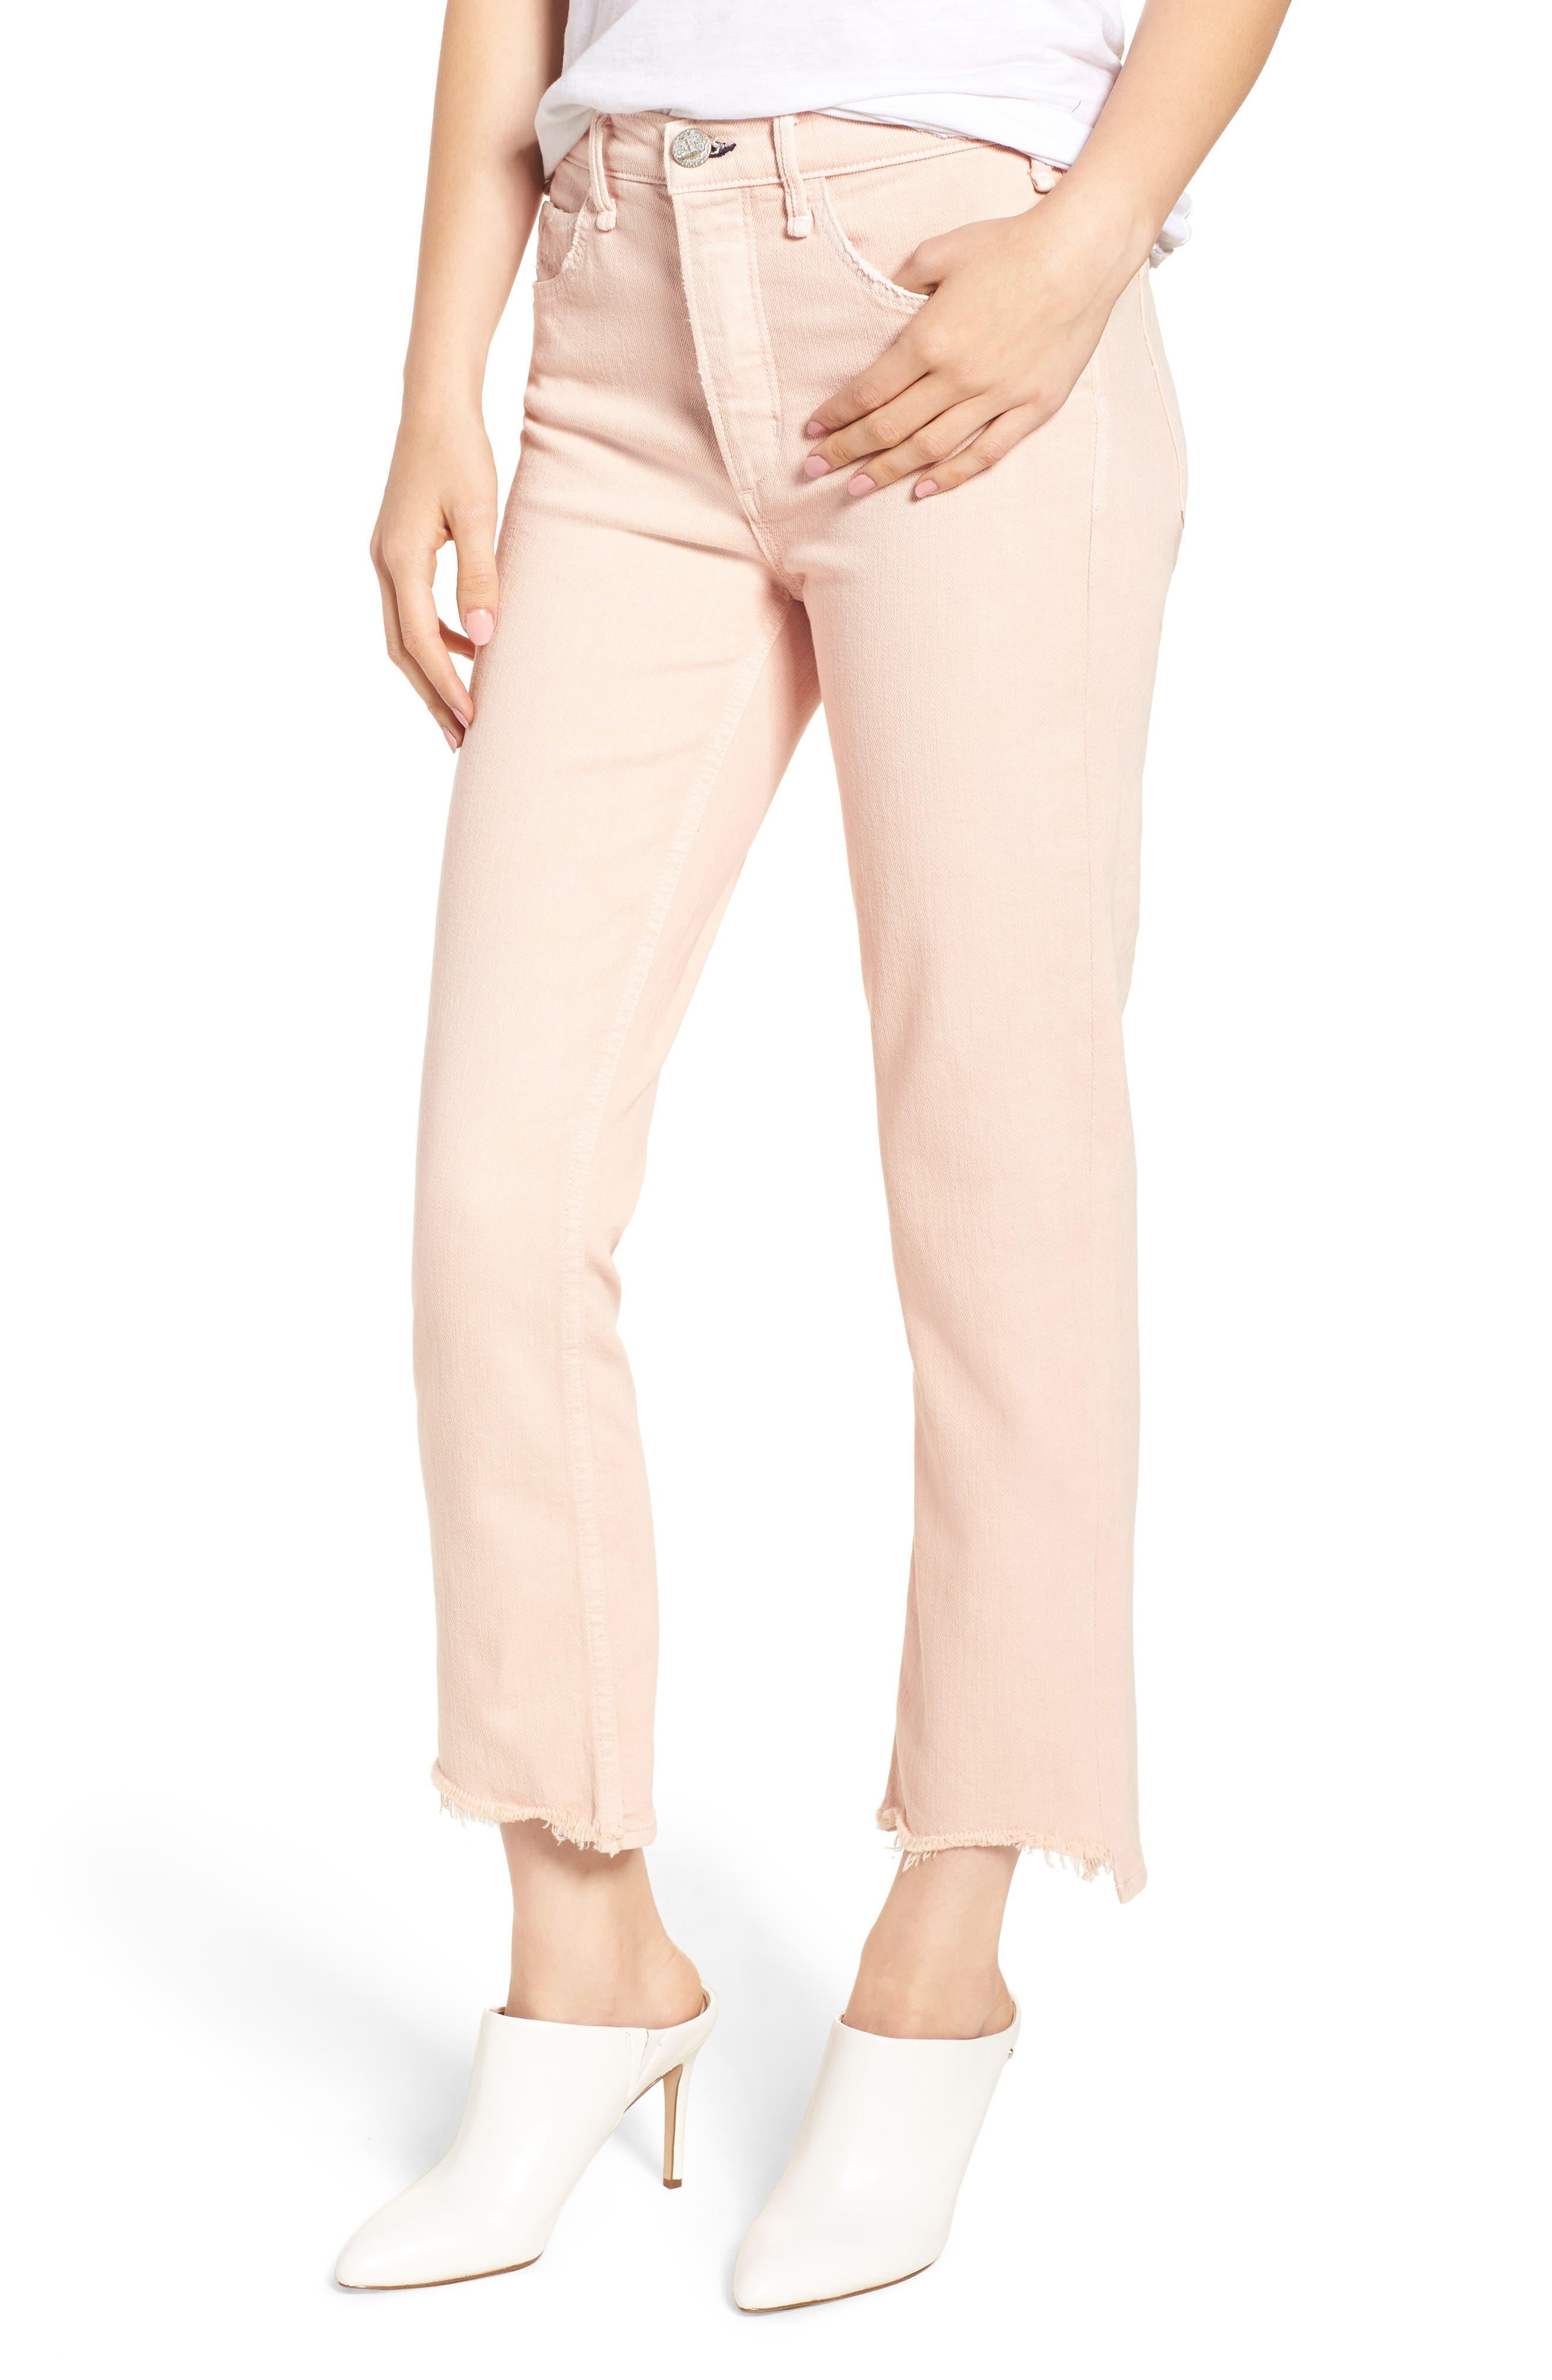 Valletta High Waist Crop Straight Leg Jeans,                             Main thumbnail 1, color,                             Punch Pink